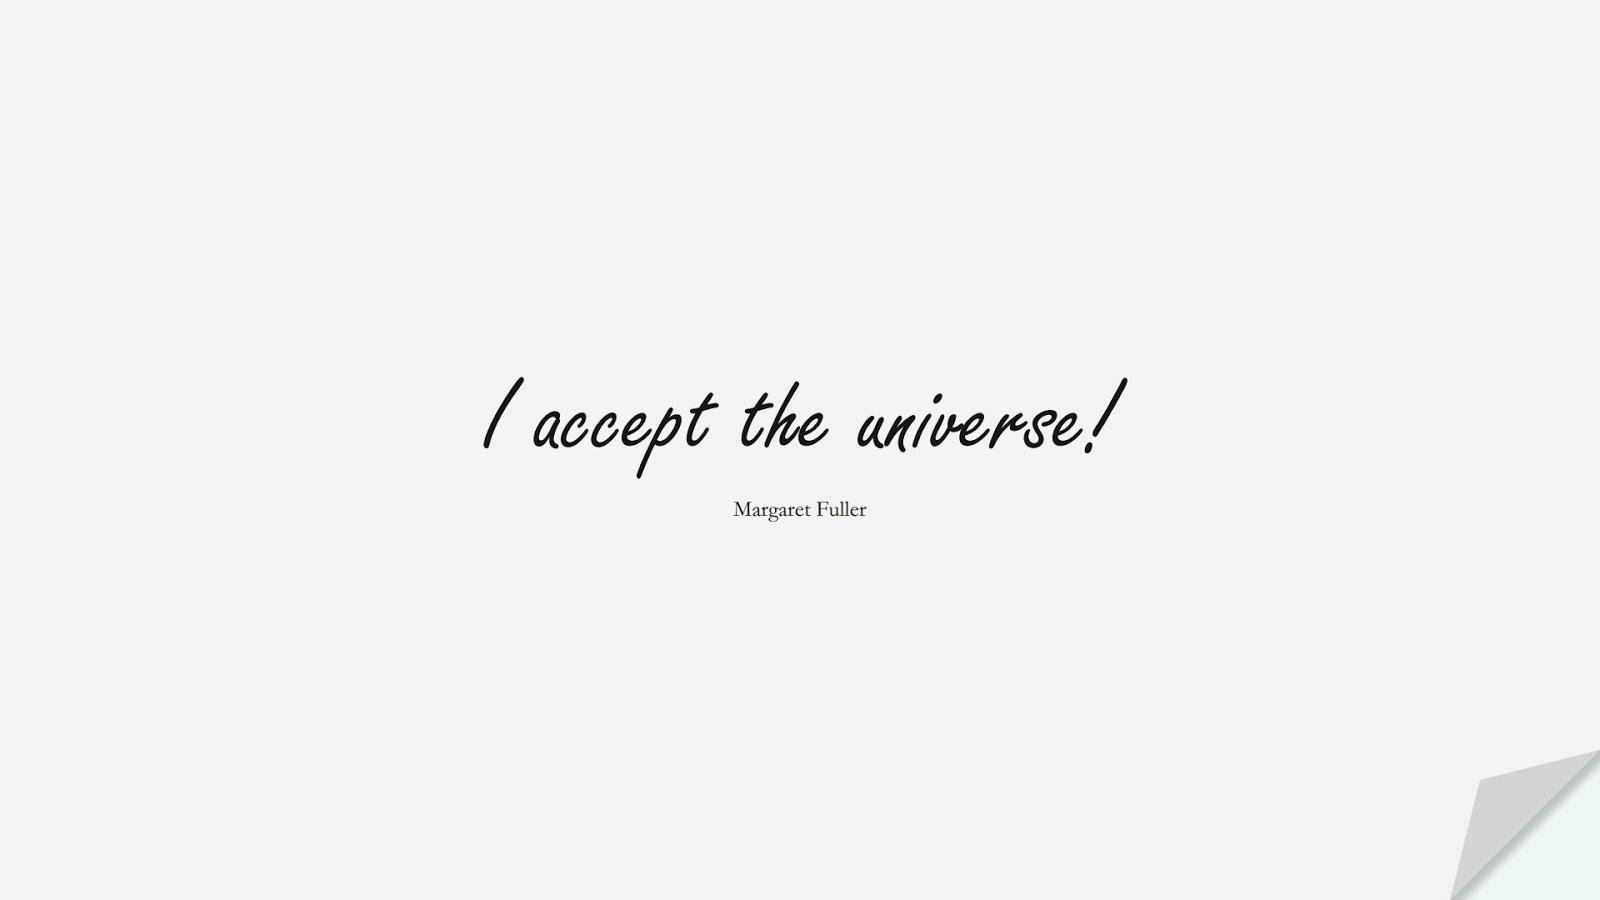 I accept the universe! (Margaret Fuller);  #HopeQuotes